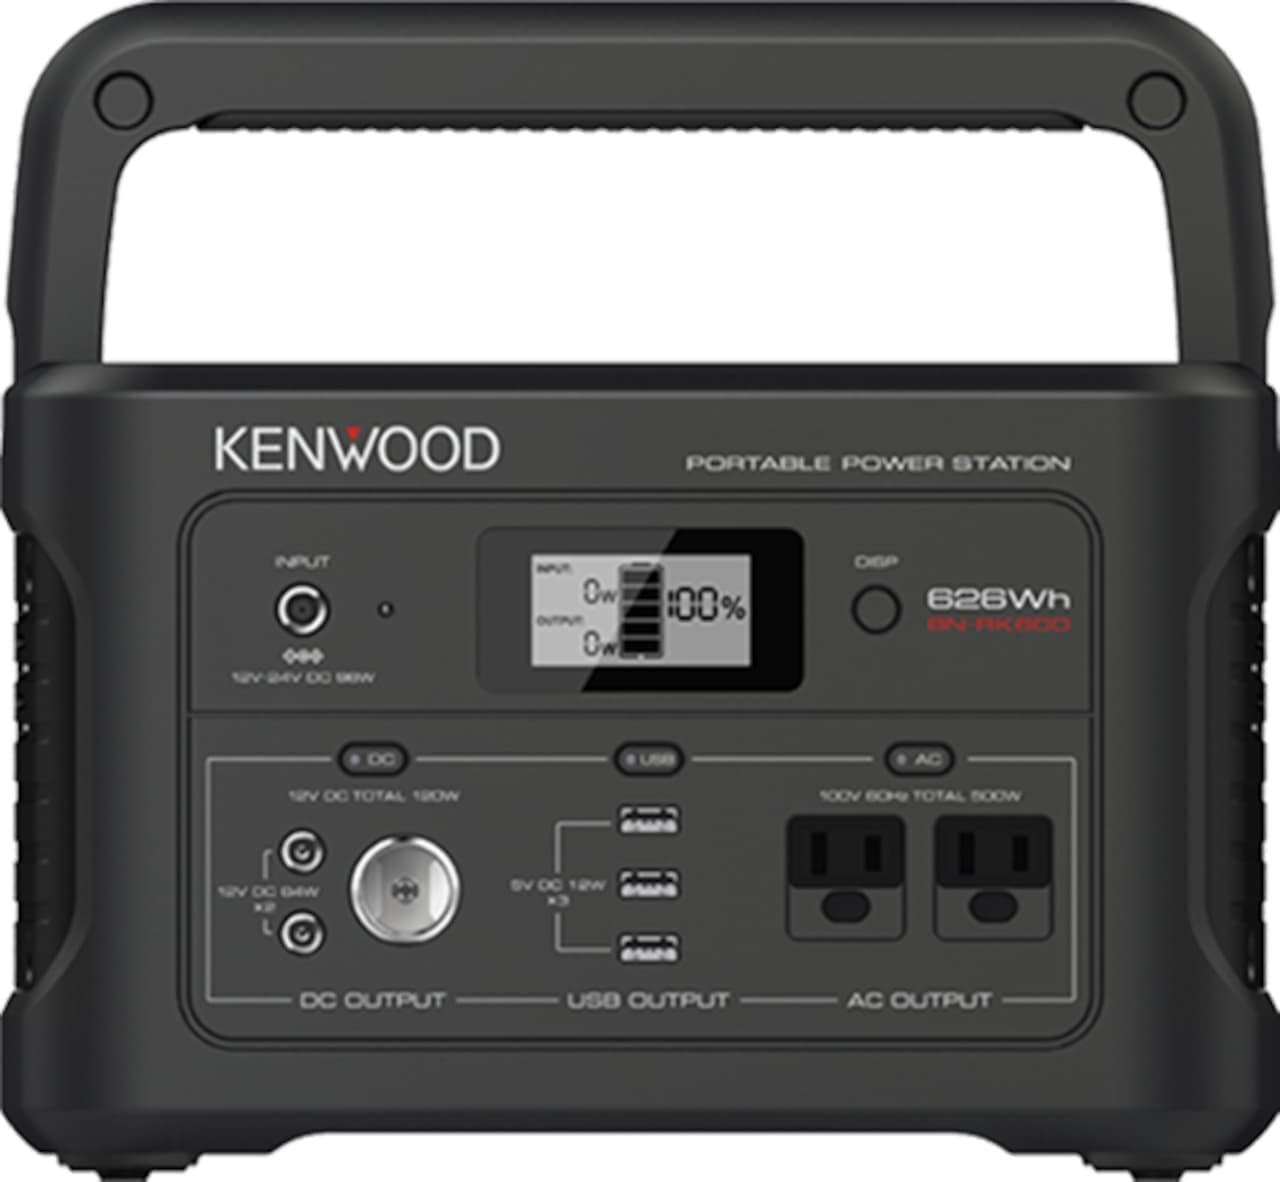 KENWOODのポータブル電源「BN-RK600」